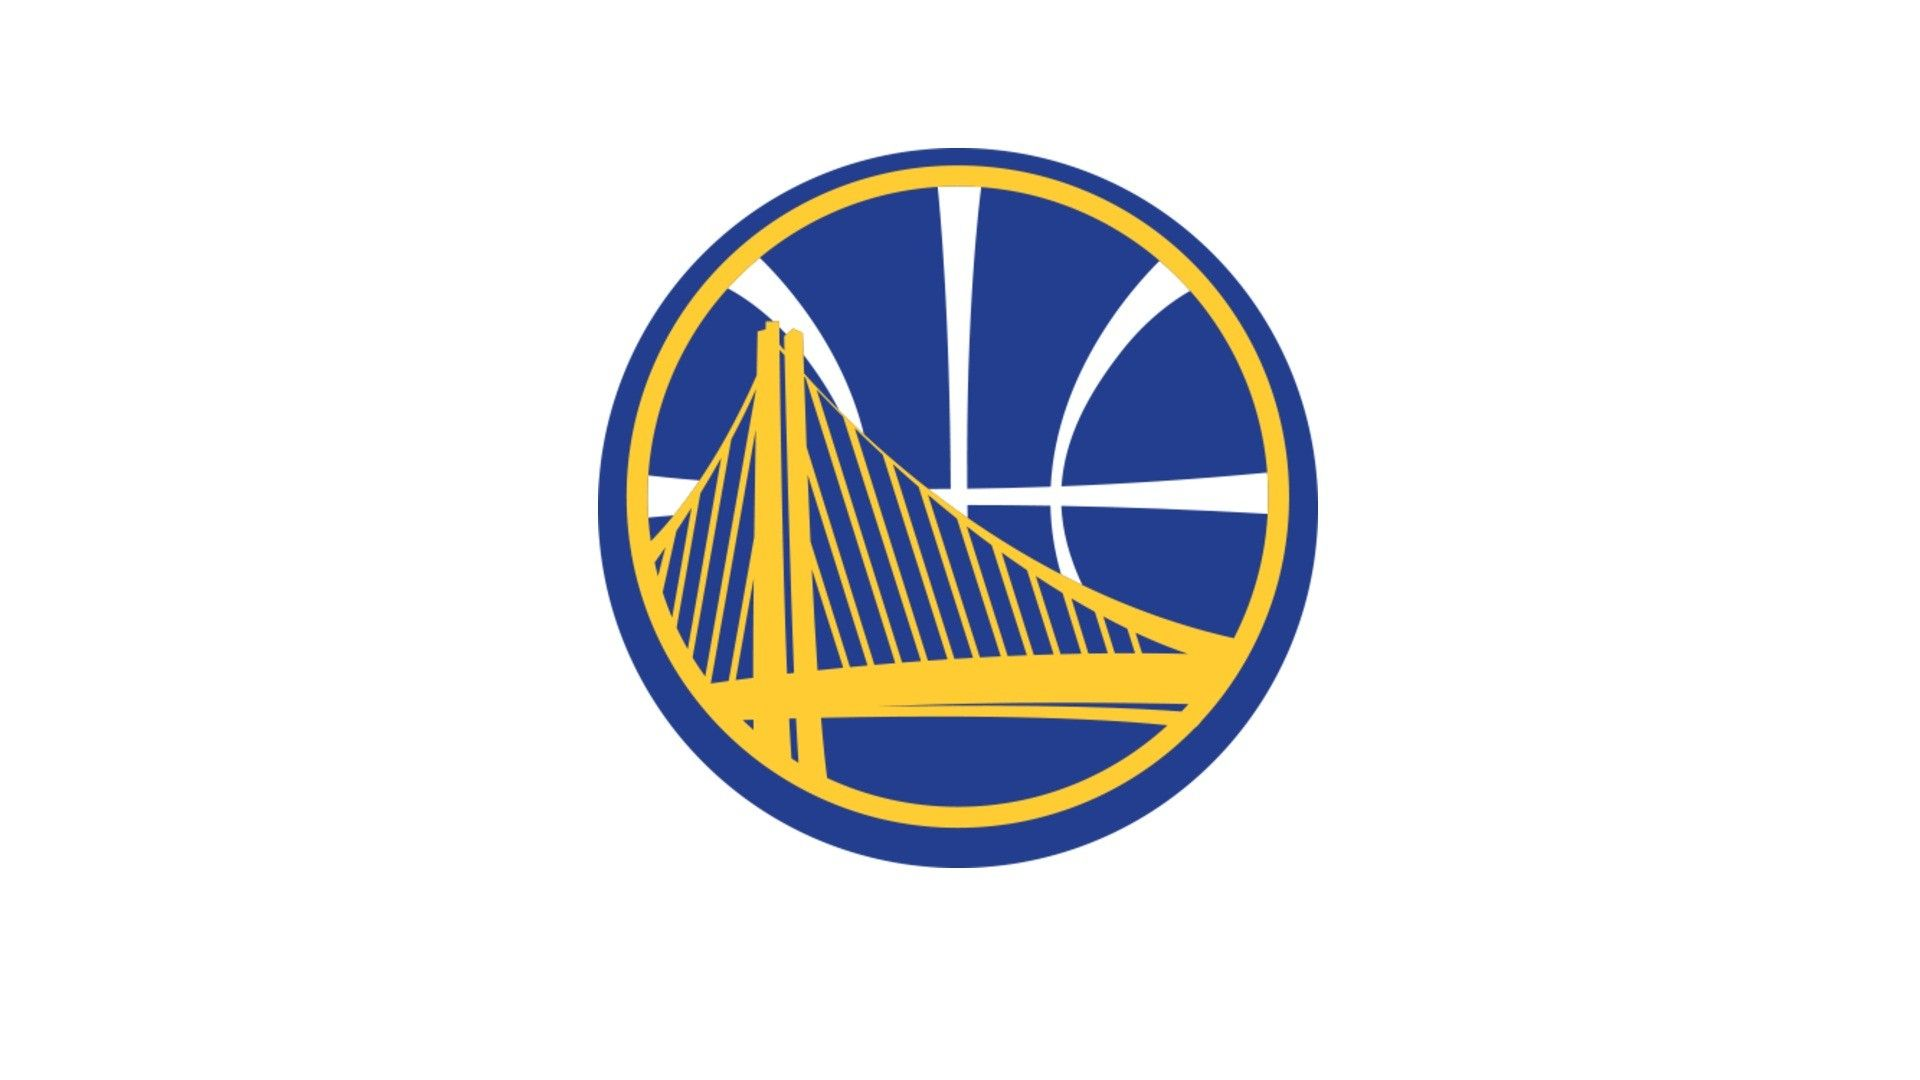 Wallpapers Golden State Warriors Logo Golden State Warriors Logo Warrior Logo Golden State Warriors